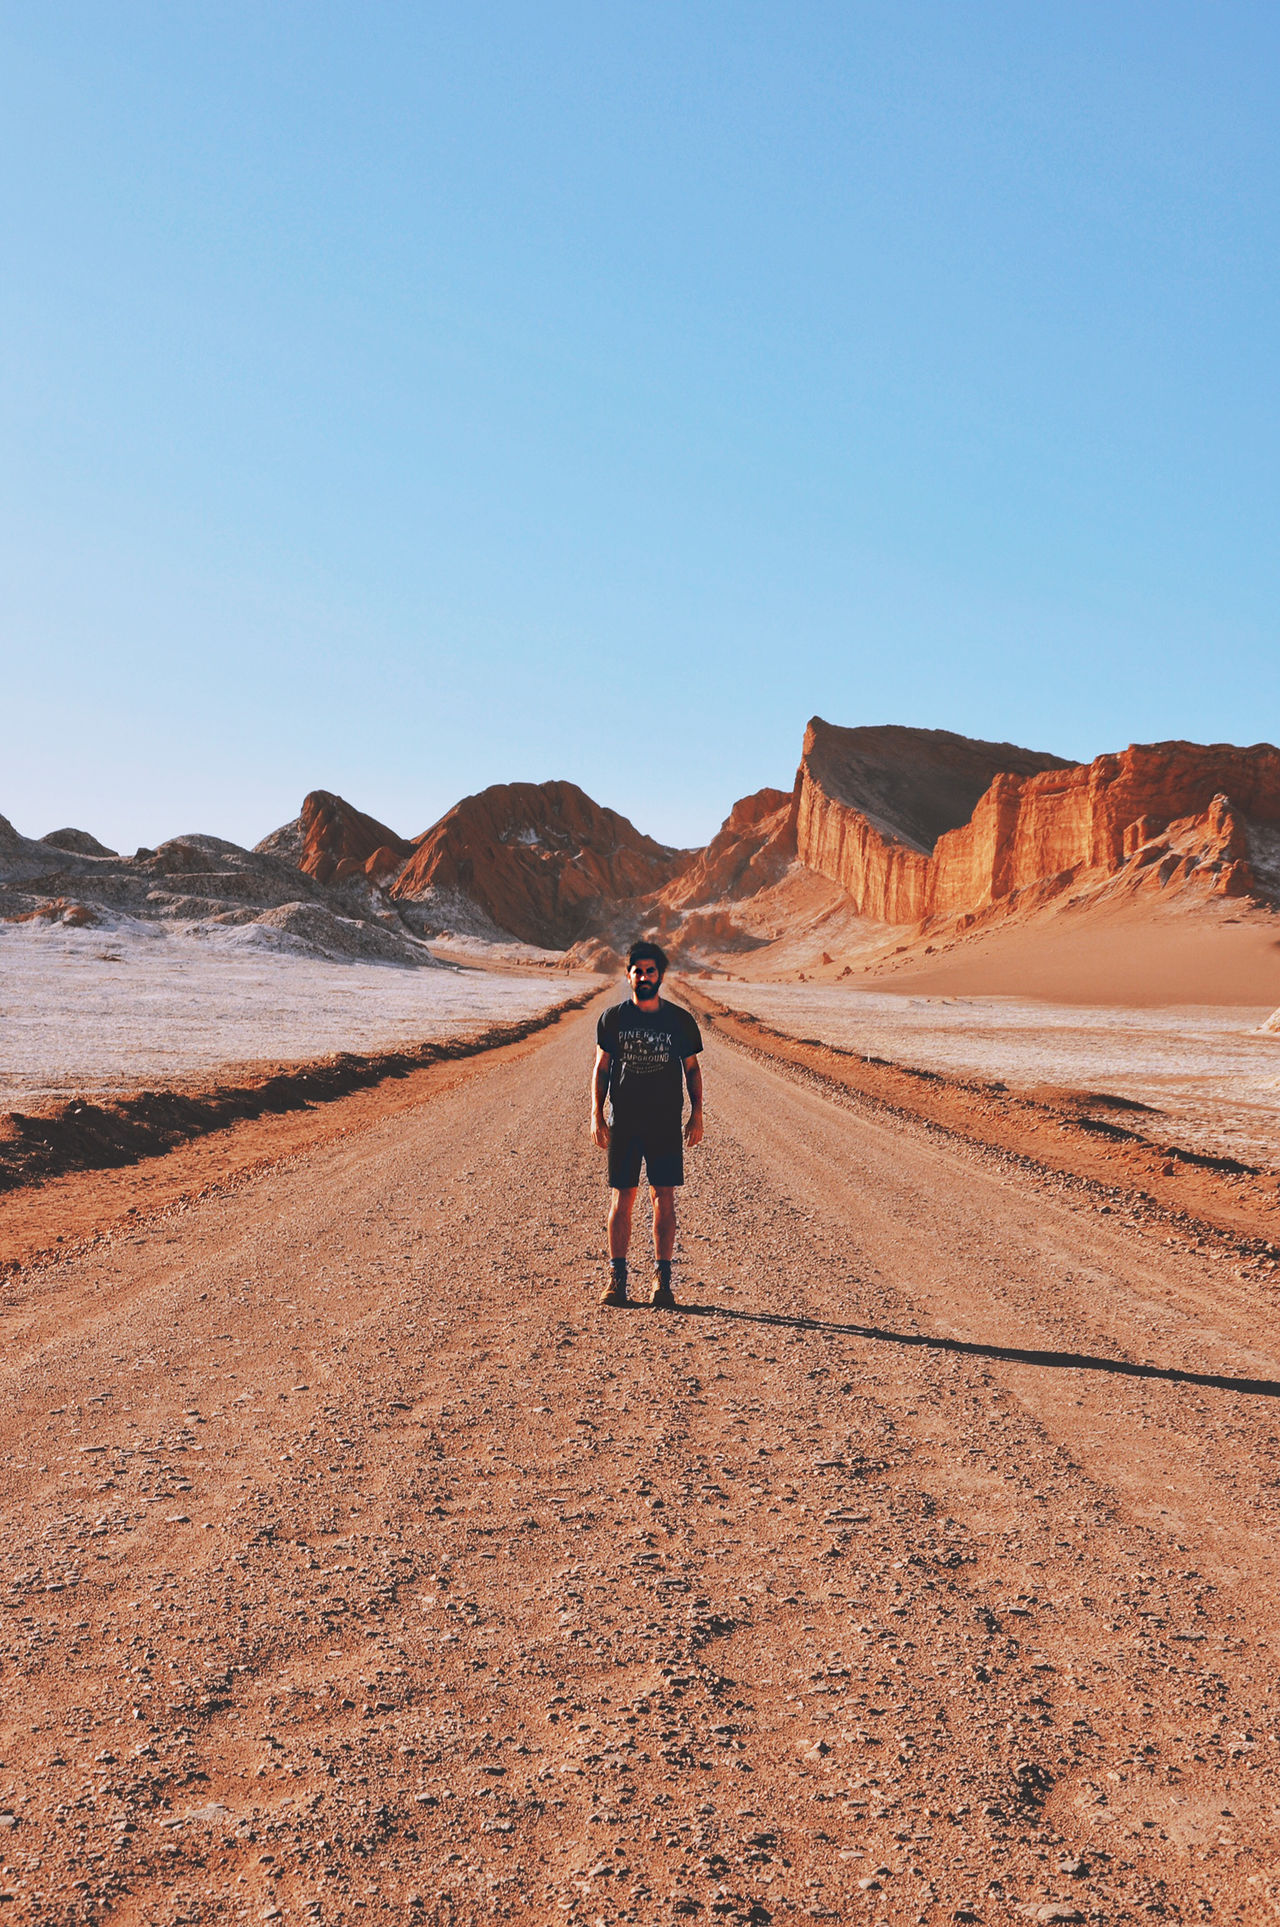 Beautiful stock photos of wüste, 30-34 Years, Antofagasta, Arid Climate, Atacama Desert